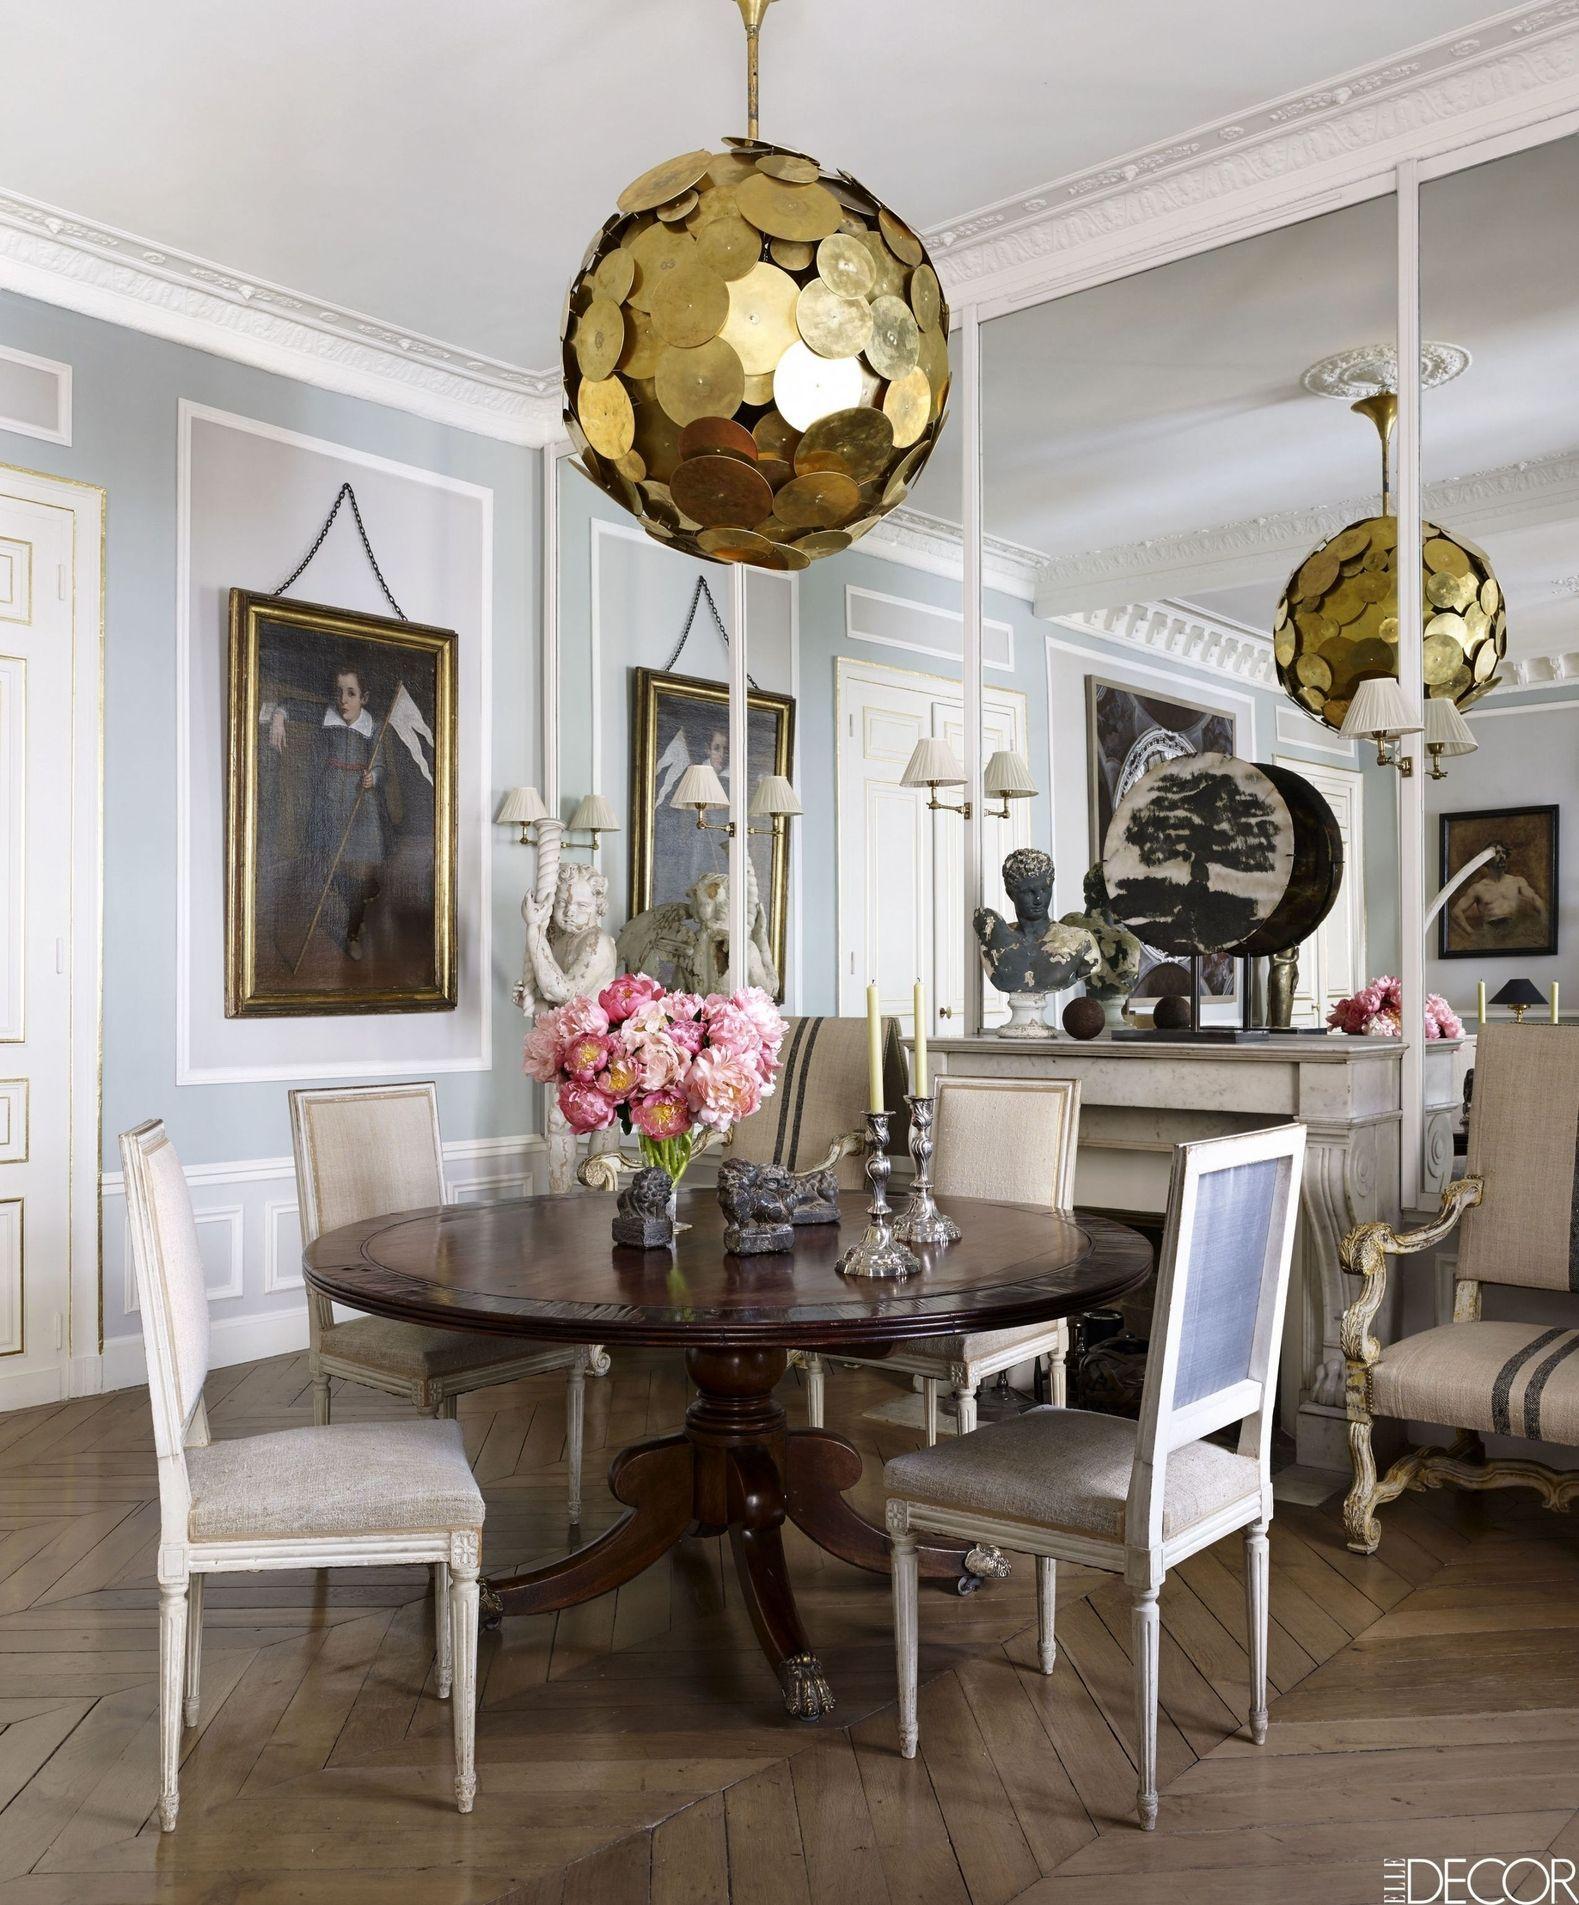 Astounding Lighting Over Dining Room Table Of 26 Best Light Fixtures Chandelier &